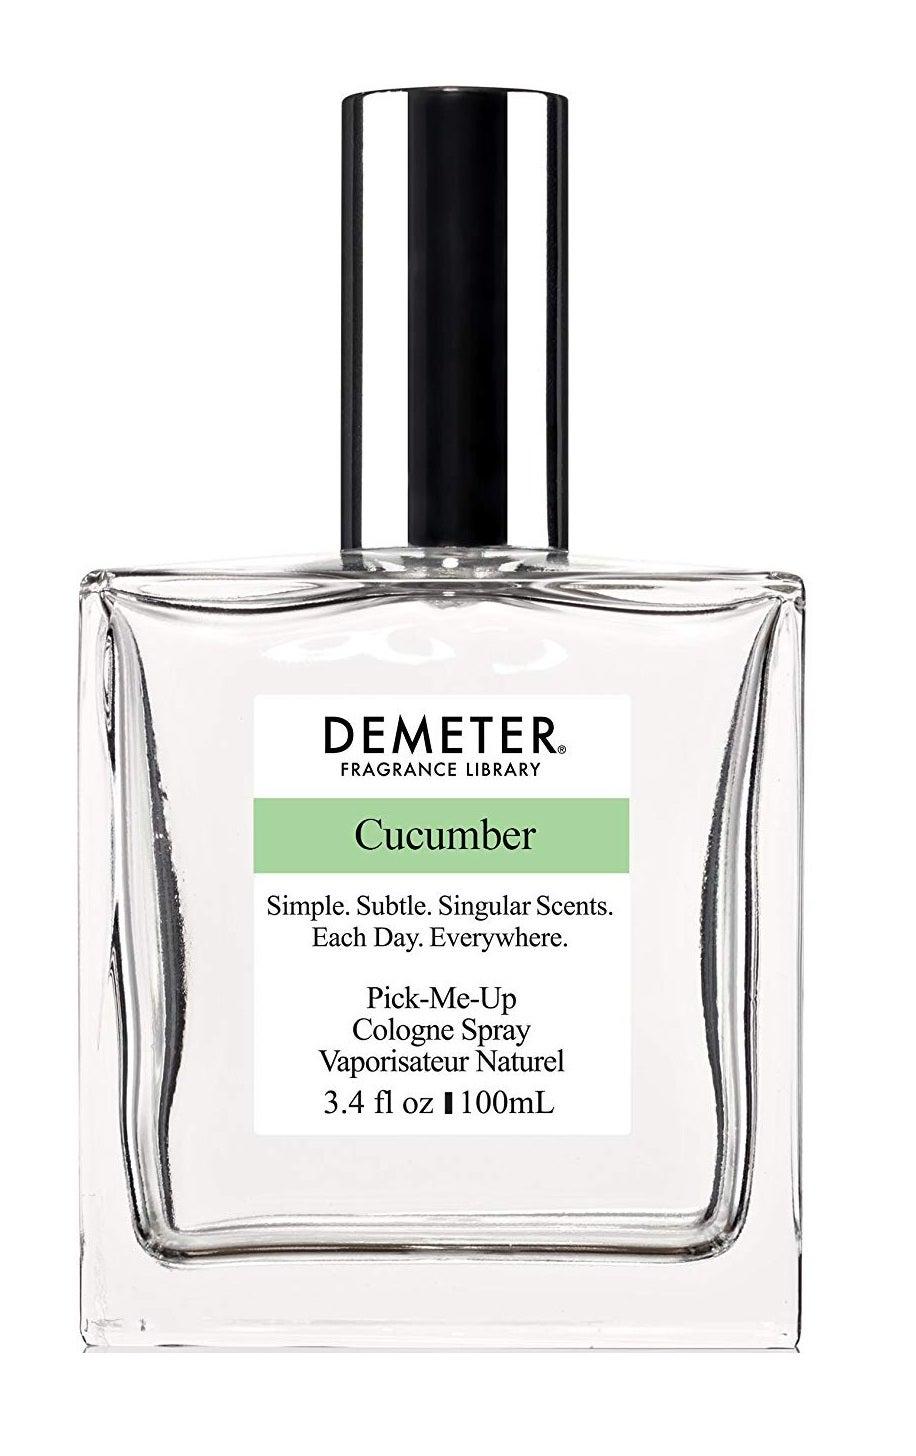 Demeter Cucumber Unisex Cologne